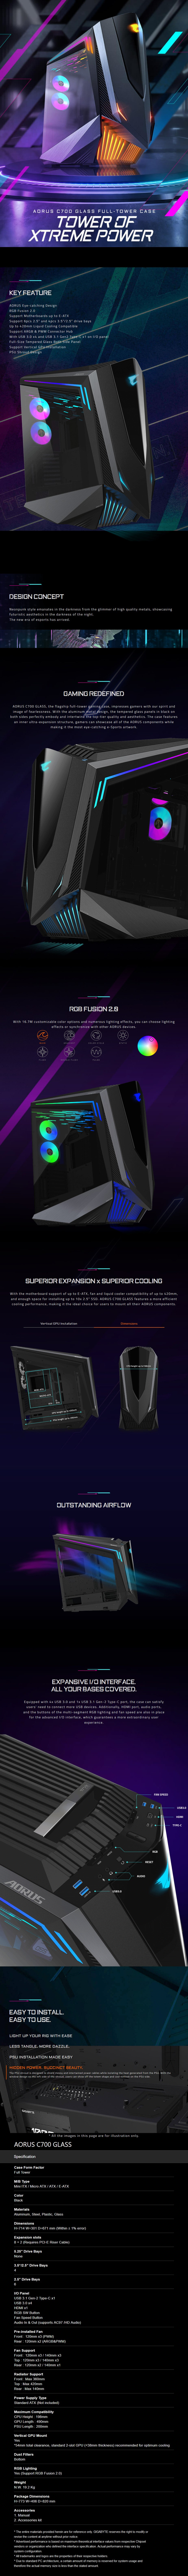 Gigabyte AORUS C700 Glass Full Tower ATX Case - Overview 1